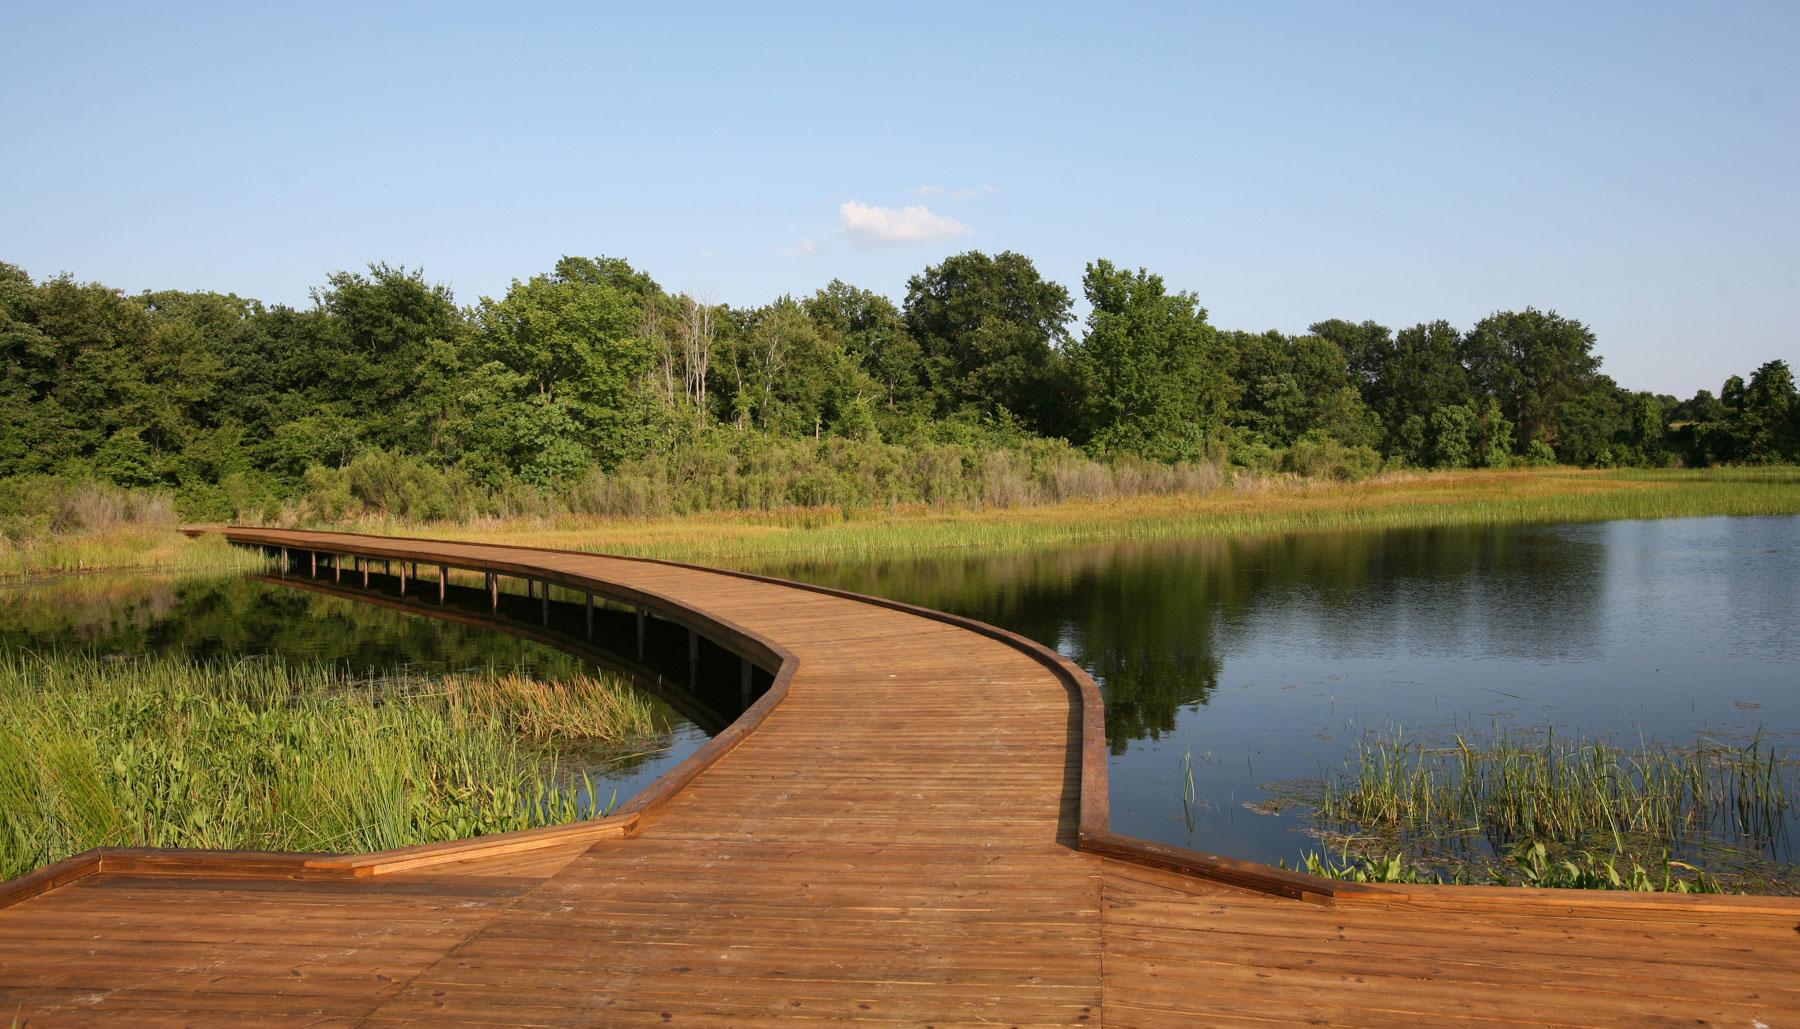 United states mabank cedar creek lake for sale on for Ceader creek